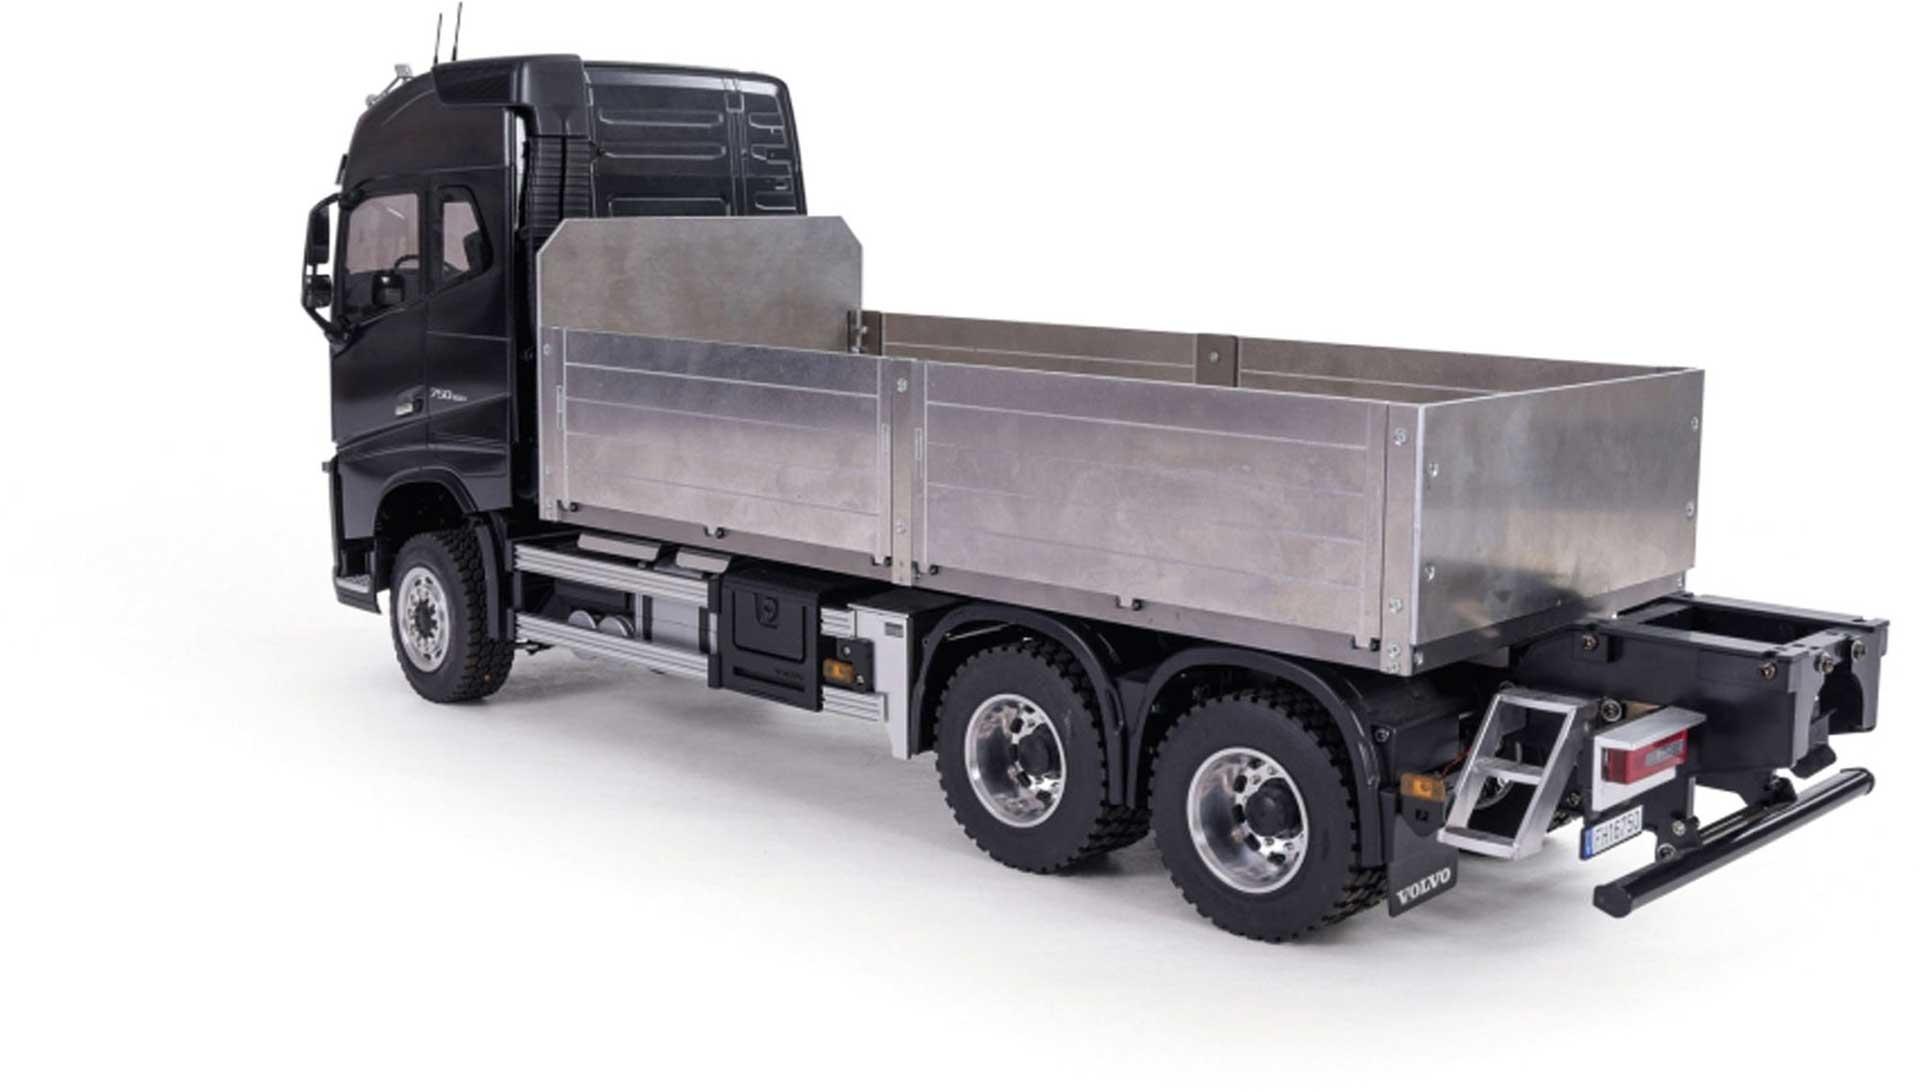 CARSON 1:14 Constructionmaterialbody short for Volvo FH16 Timbertransporter